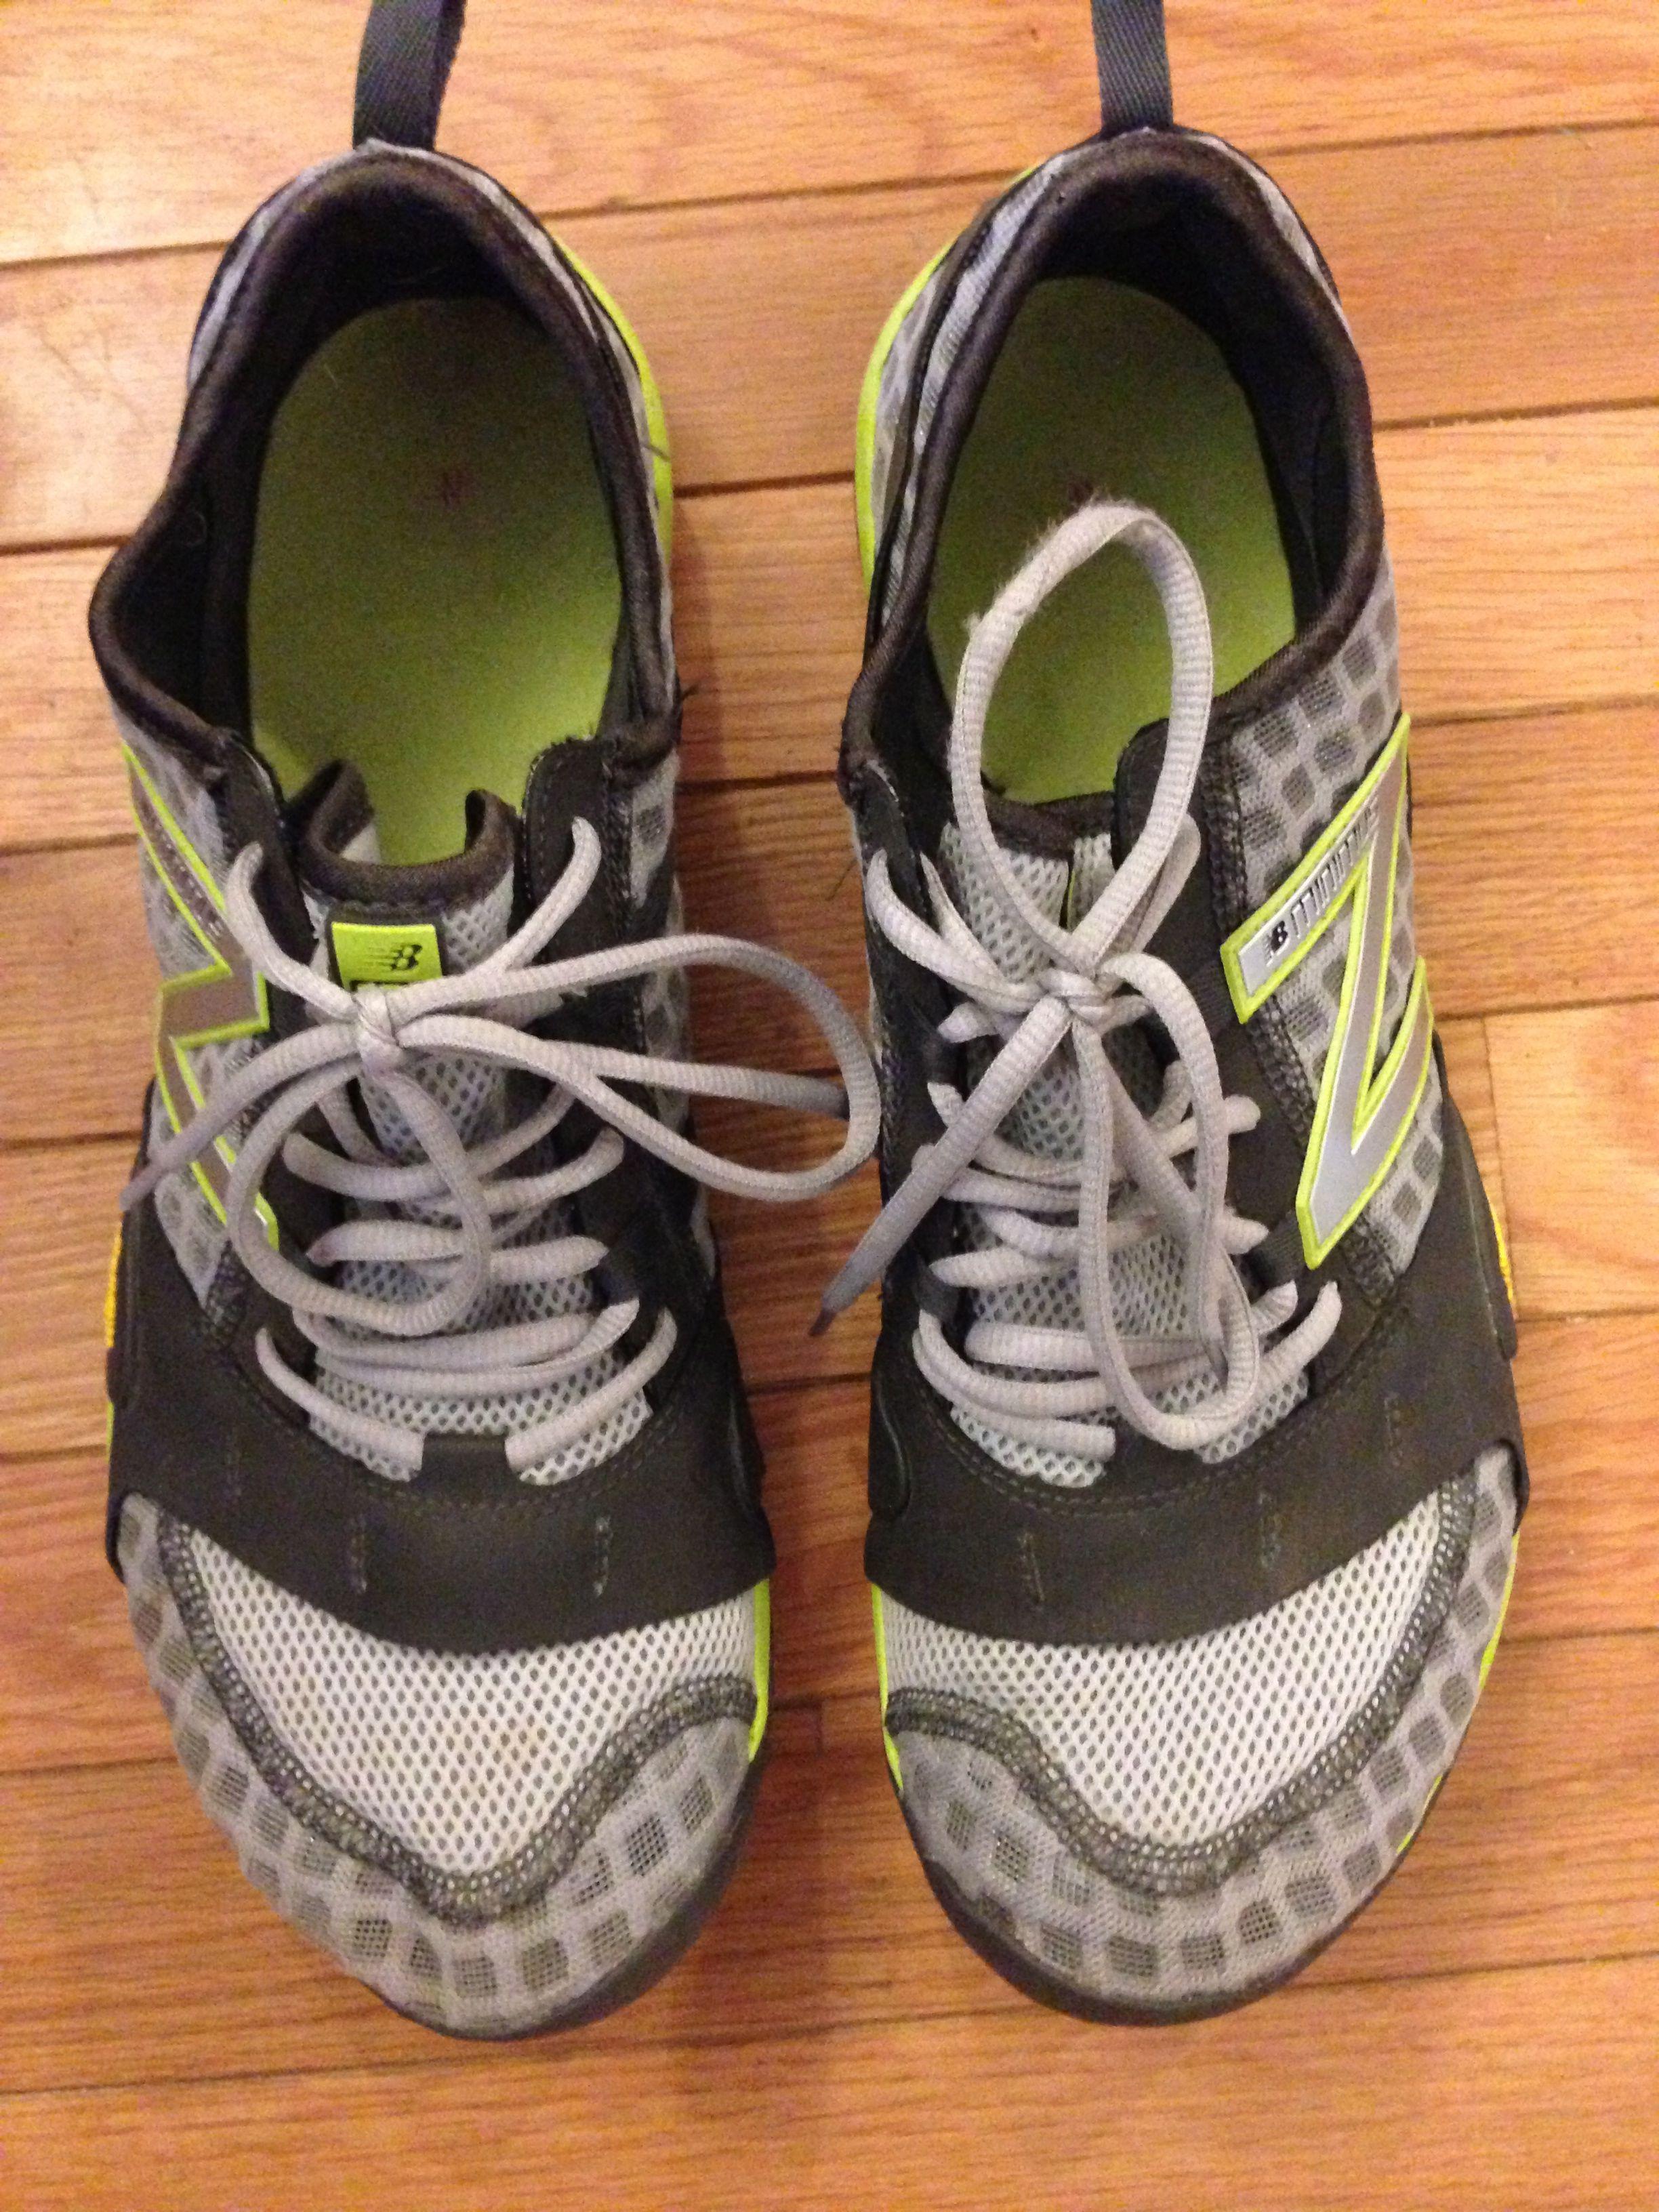 New Balance Minimus Running Shoe Review